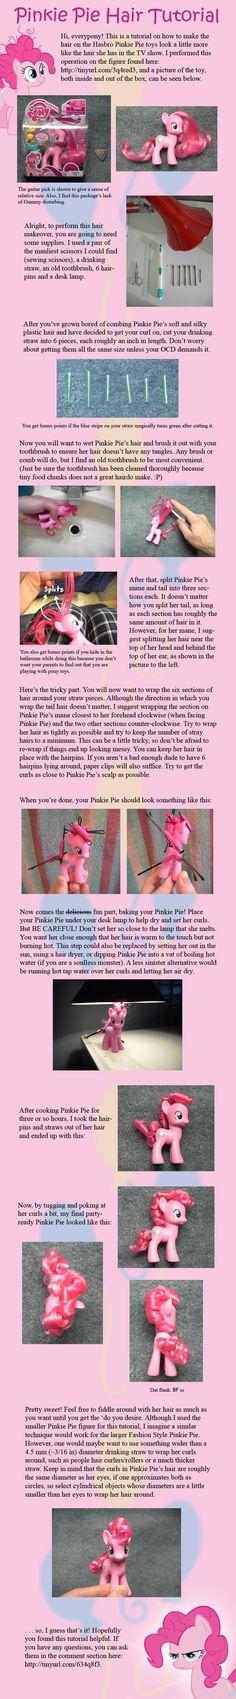 Pinkie Pie Hair Tutorial by ~countschlick on deviantART . I really want to get into custom ponies now. Mlp My Little Pony, My Little Pony Friendship, Mlp Hairstyles, Barbie, Little Poney, Nerd Love, Pinkie Pie, Fluttershy, Rainbow Dash